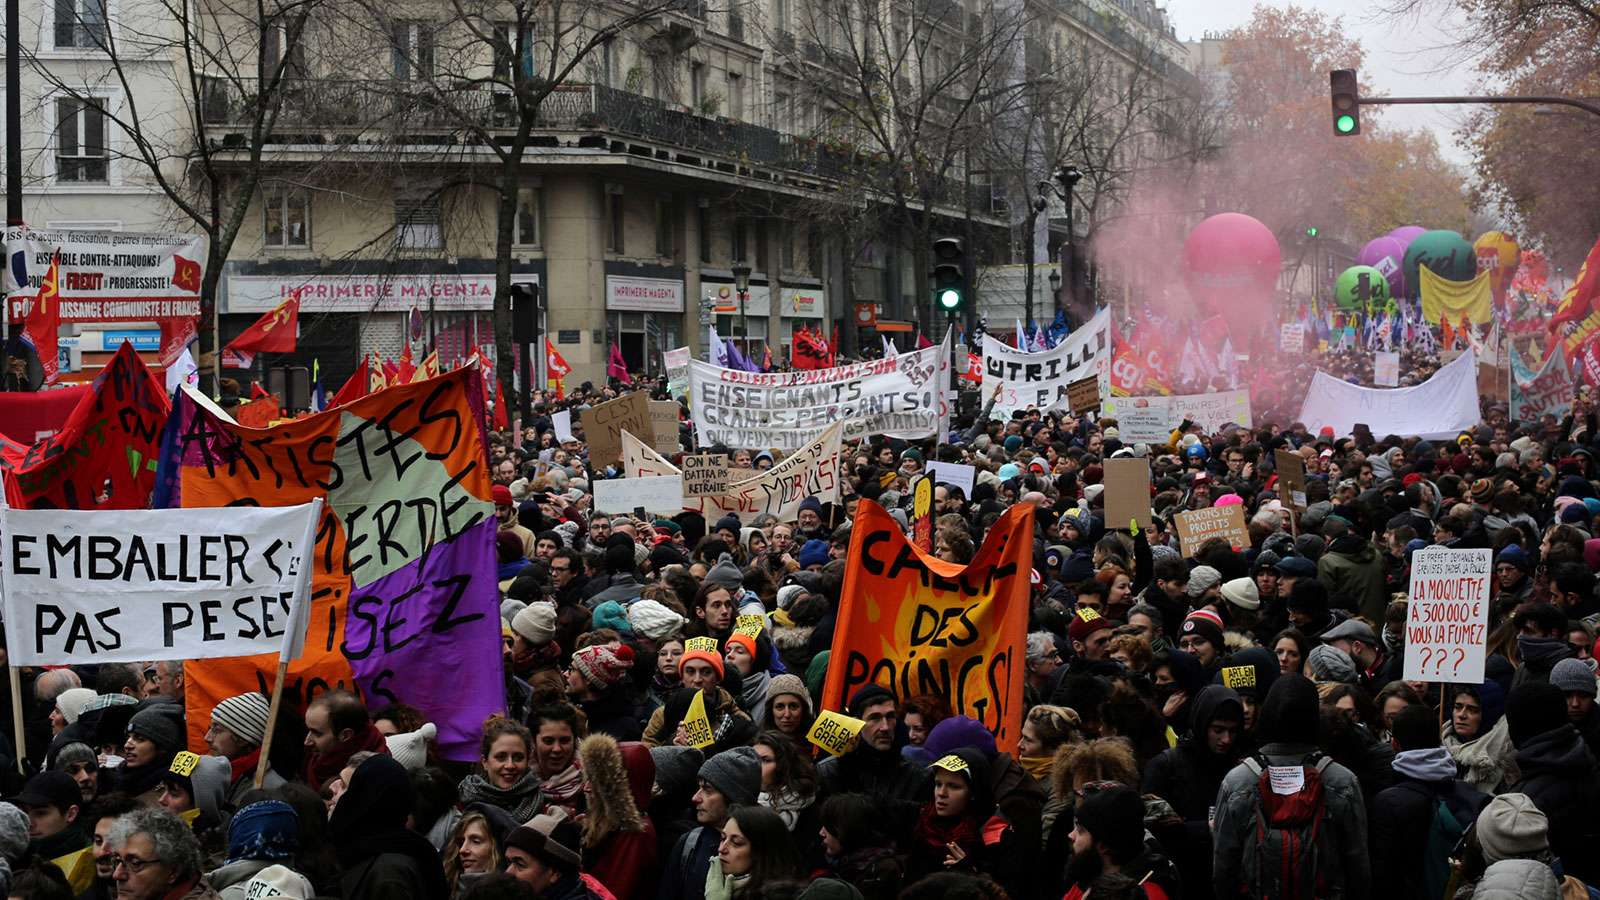 france ΓΑΛΛΙΑ απεργία ανατροπές στην Ασφάλιση